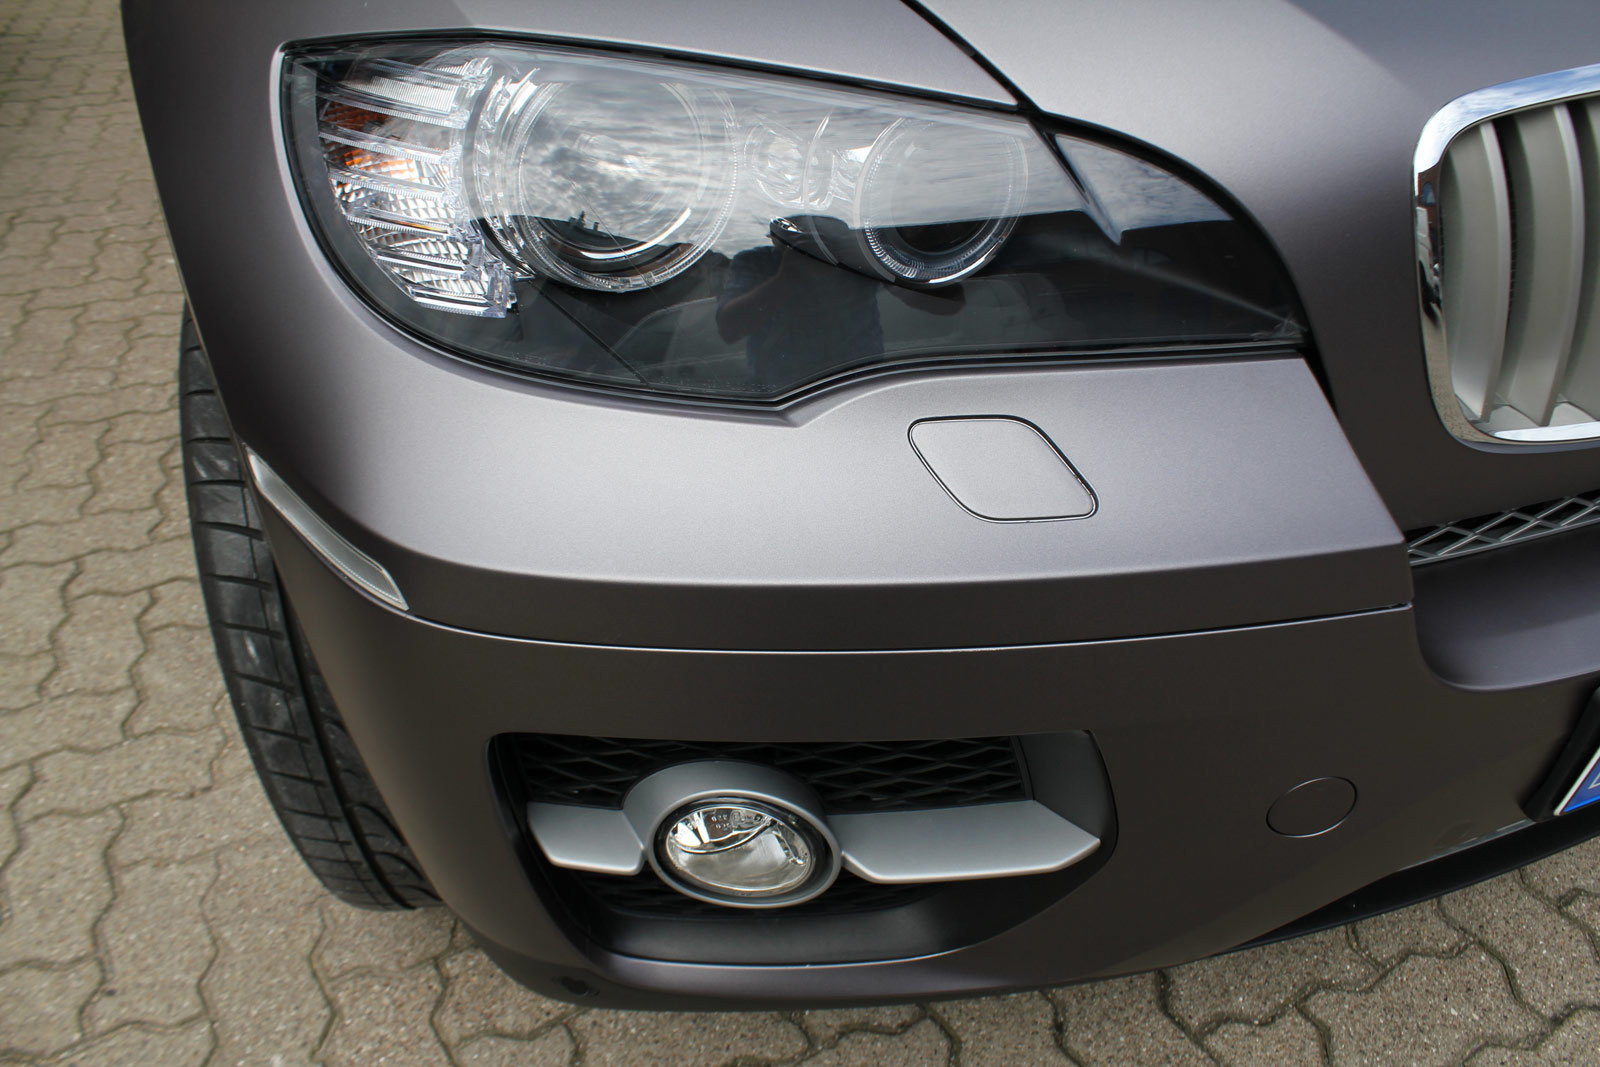 BMW_X6_Folierung_Anthrazit_Metallic_Matt_07